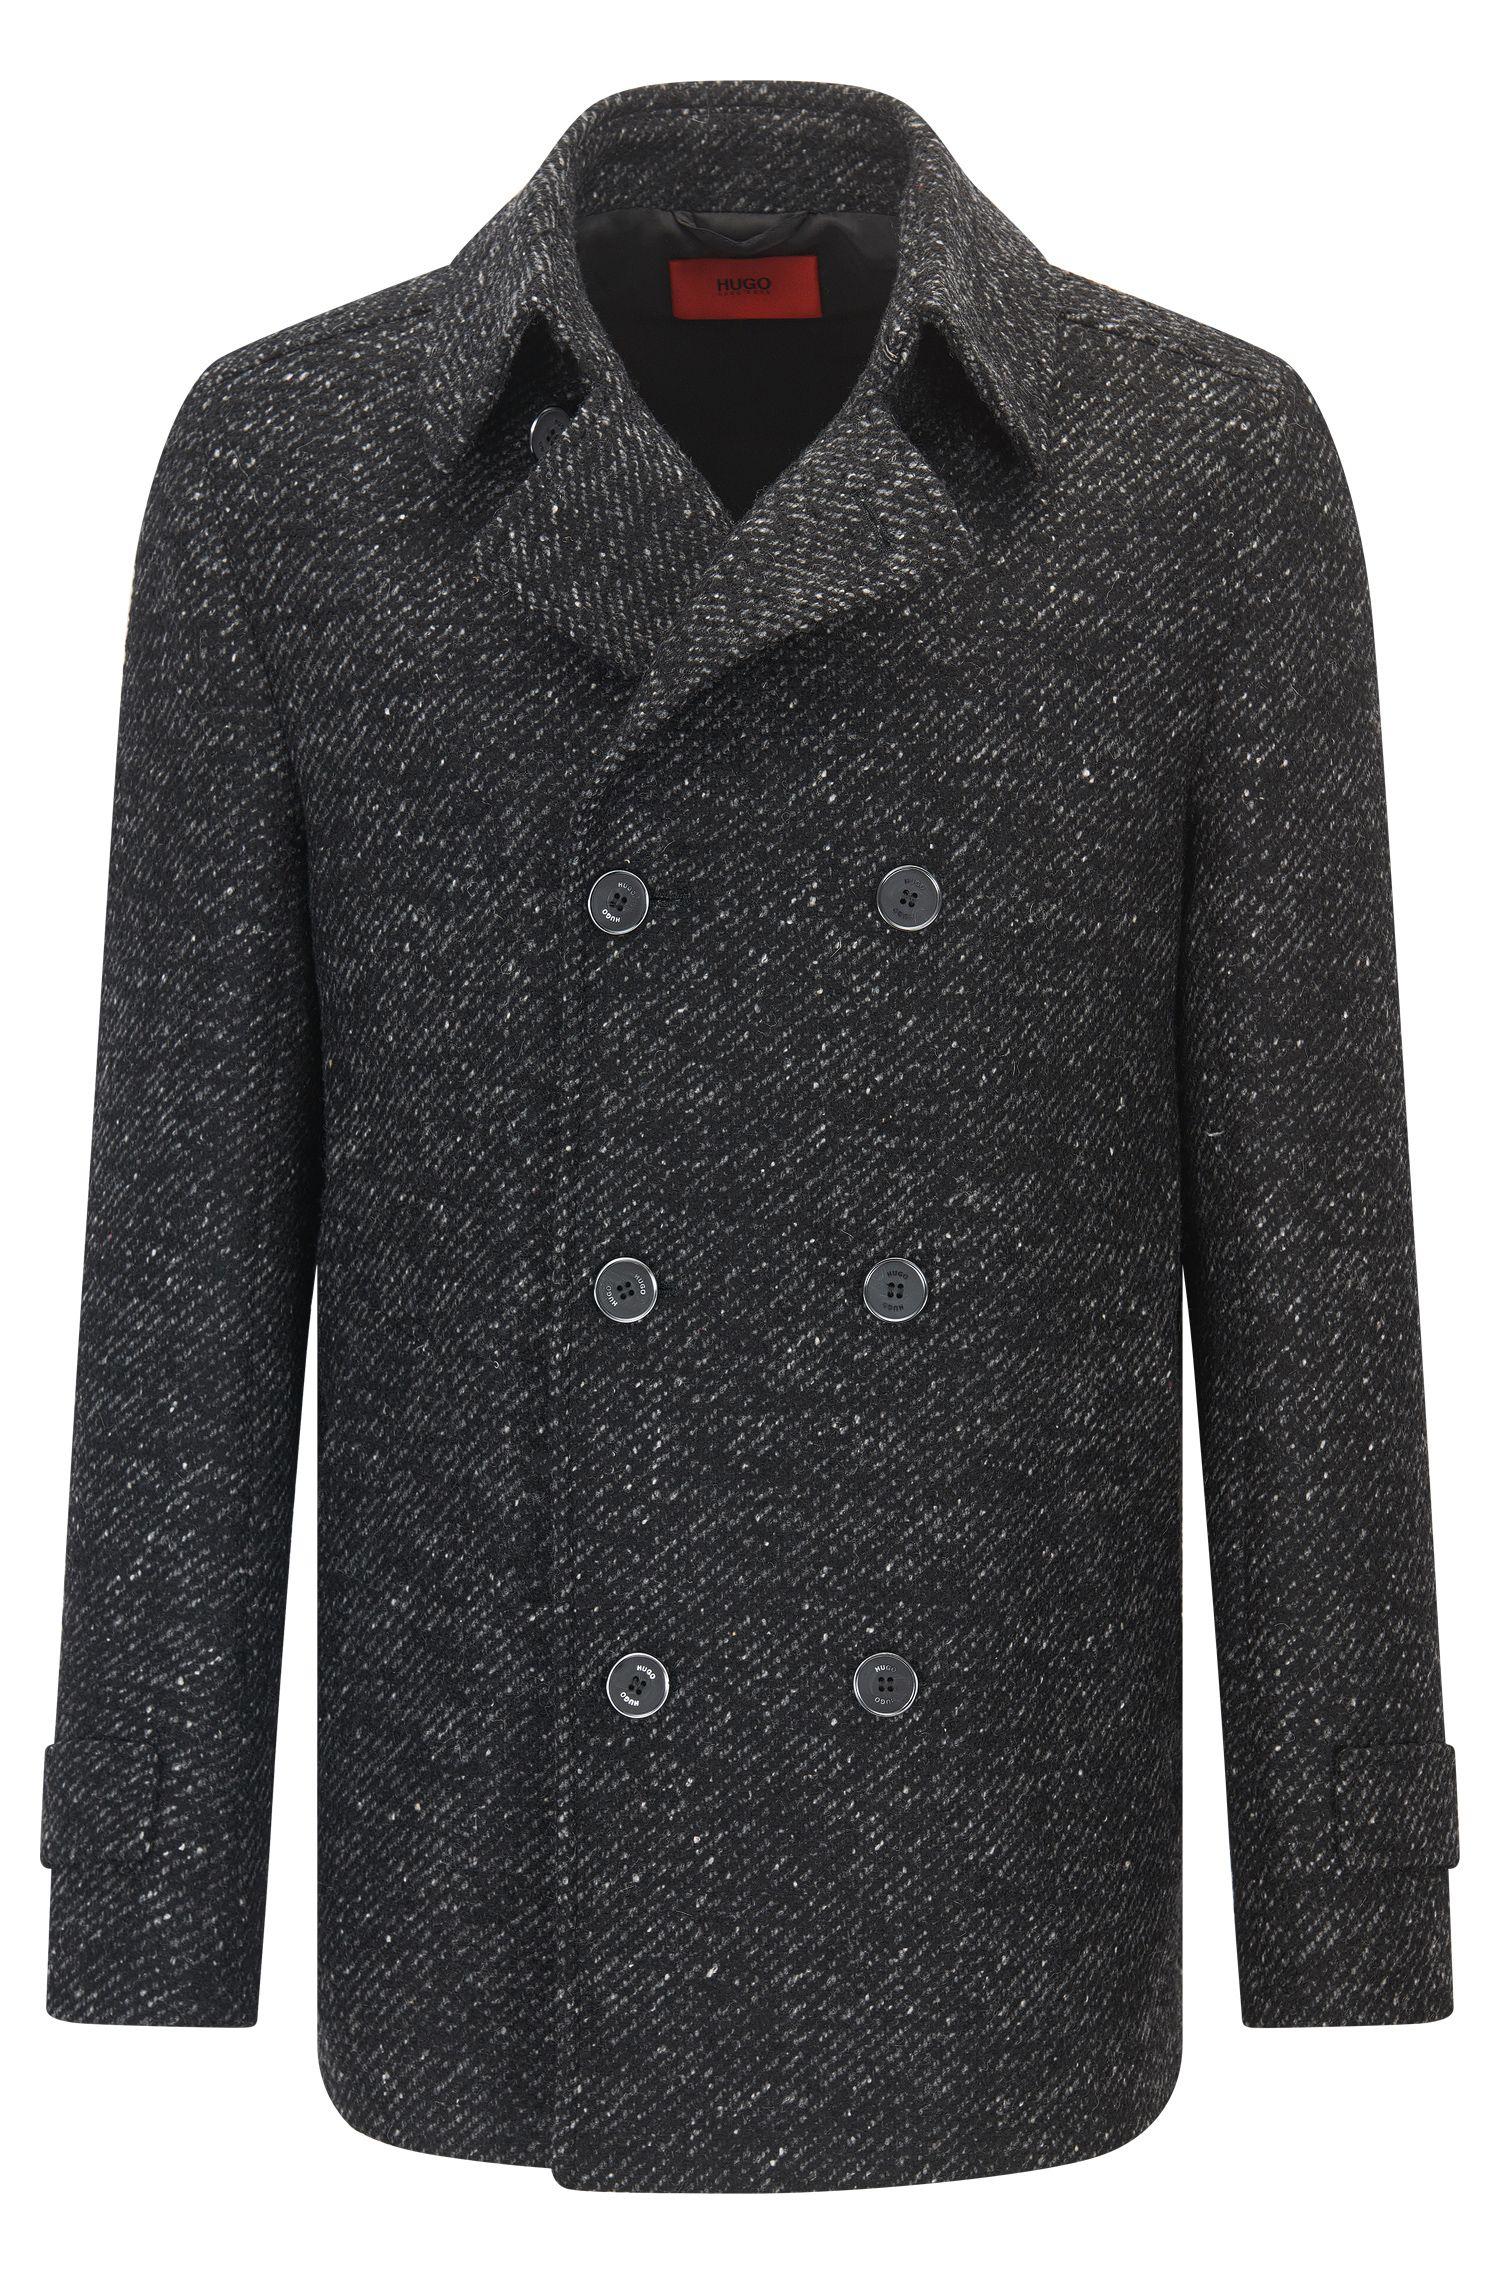 Giubbotto in stile caban slim fit in misto lana